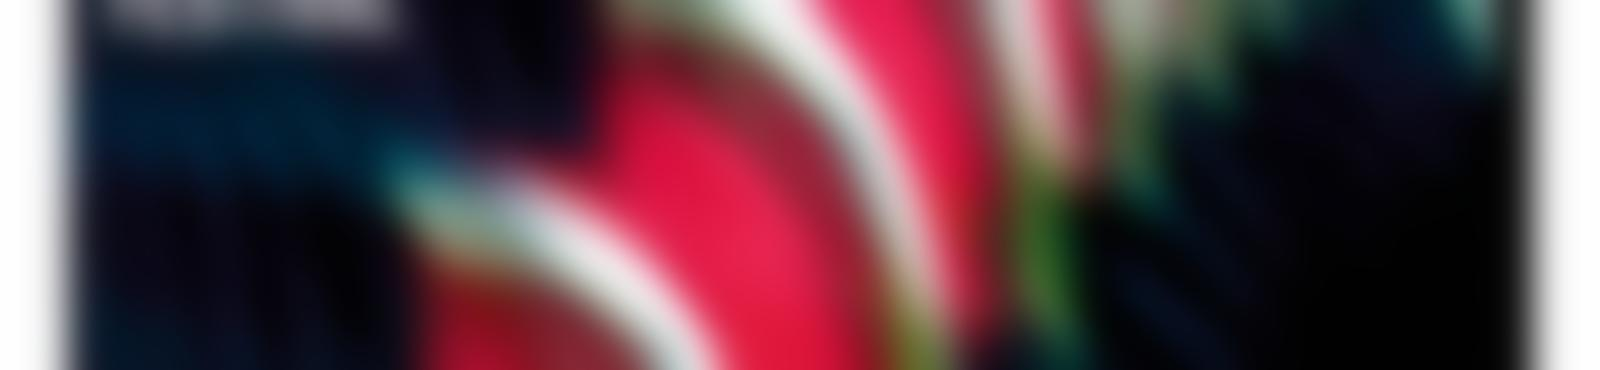 Blurred ced92bc3 b4fa 4231 83e5 676a830869d4